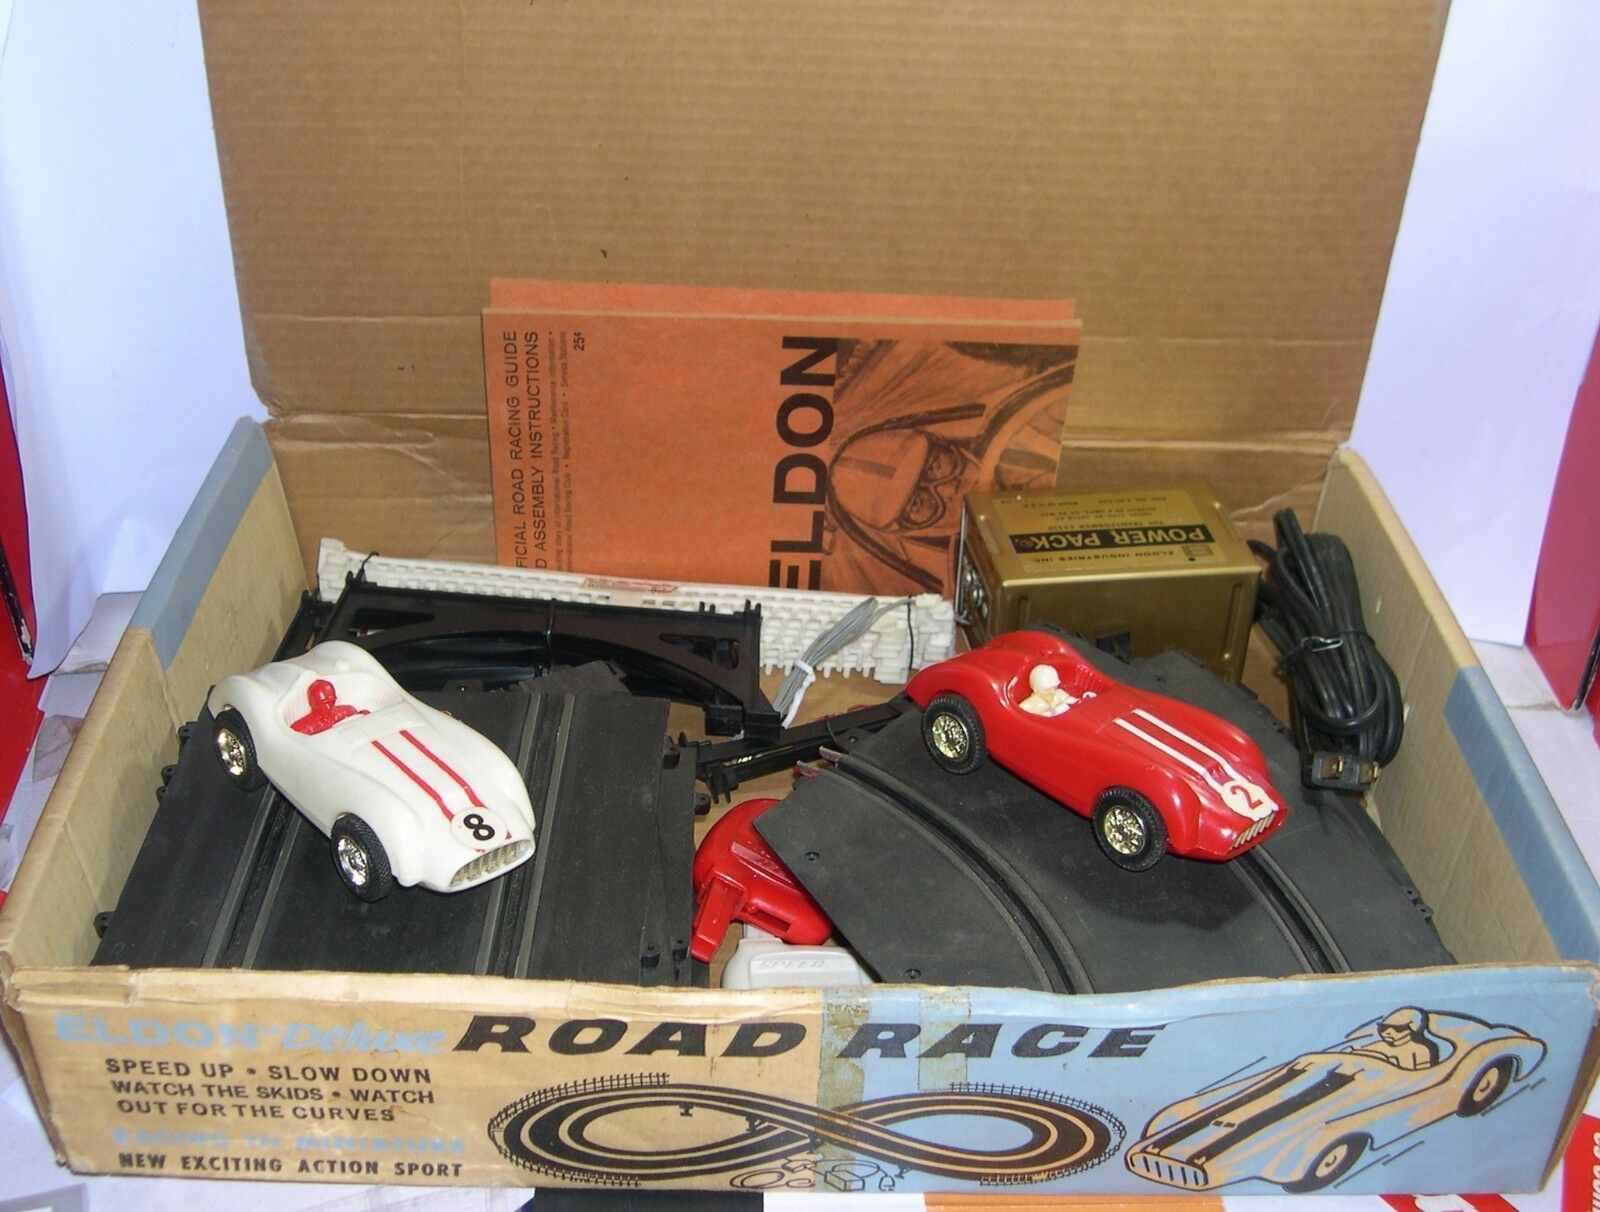 ELDON 9805 9805 9805 SCHALTUNG DE LUXE ROAD RACE 2 FERRARI-TYP SPORT CARS EXC.CONDITION  | Moderne und elegante Mode  435ea0